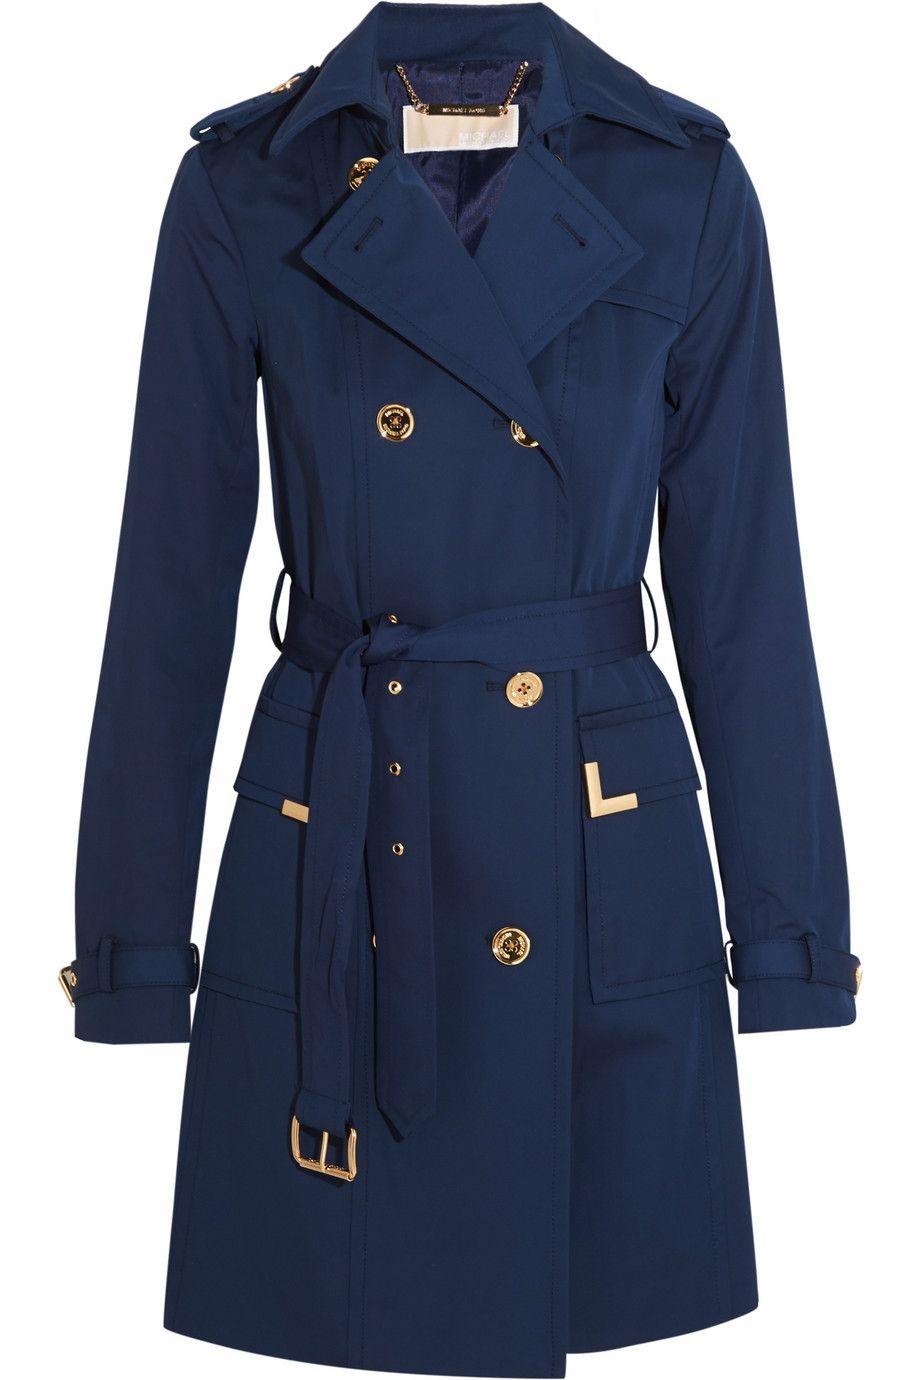 MICHAEL Michael Kors | Beverly cotton-blend trench coat | NET-A-PORTER